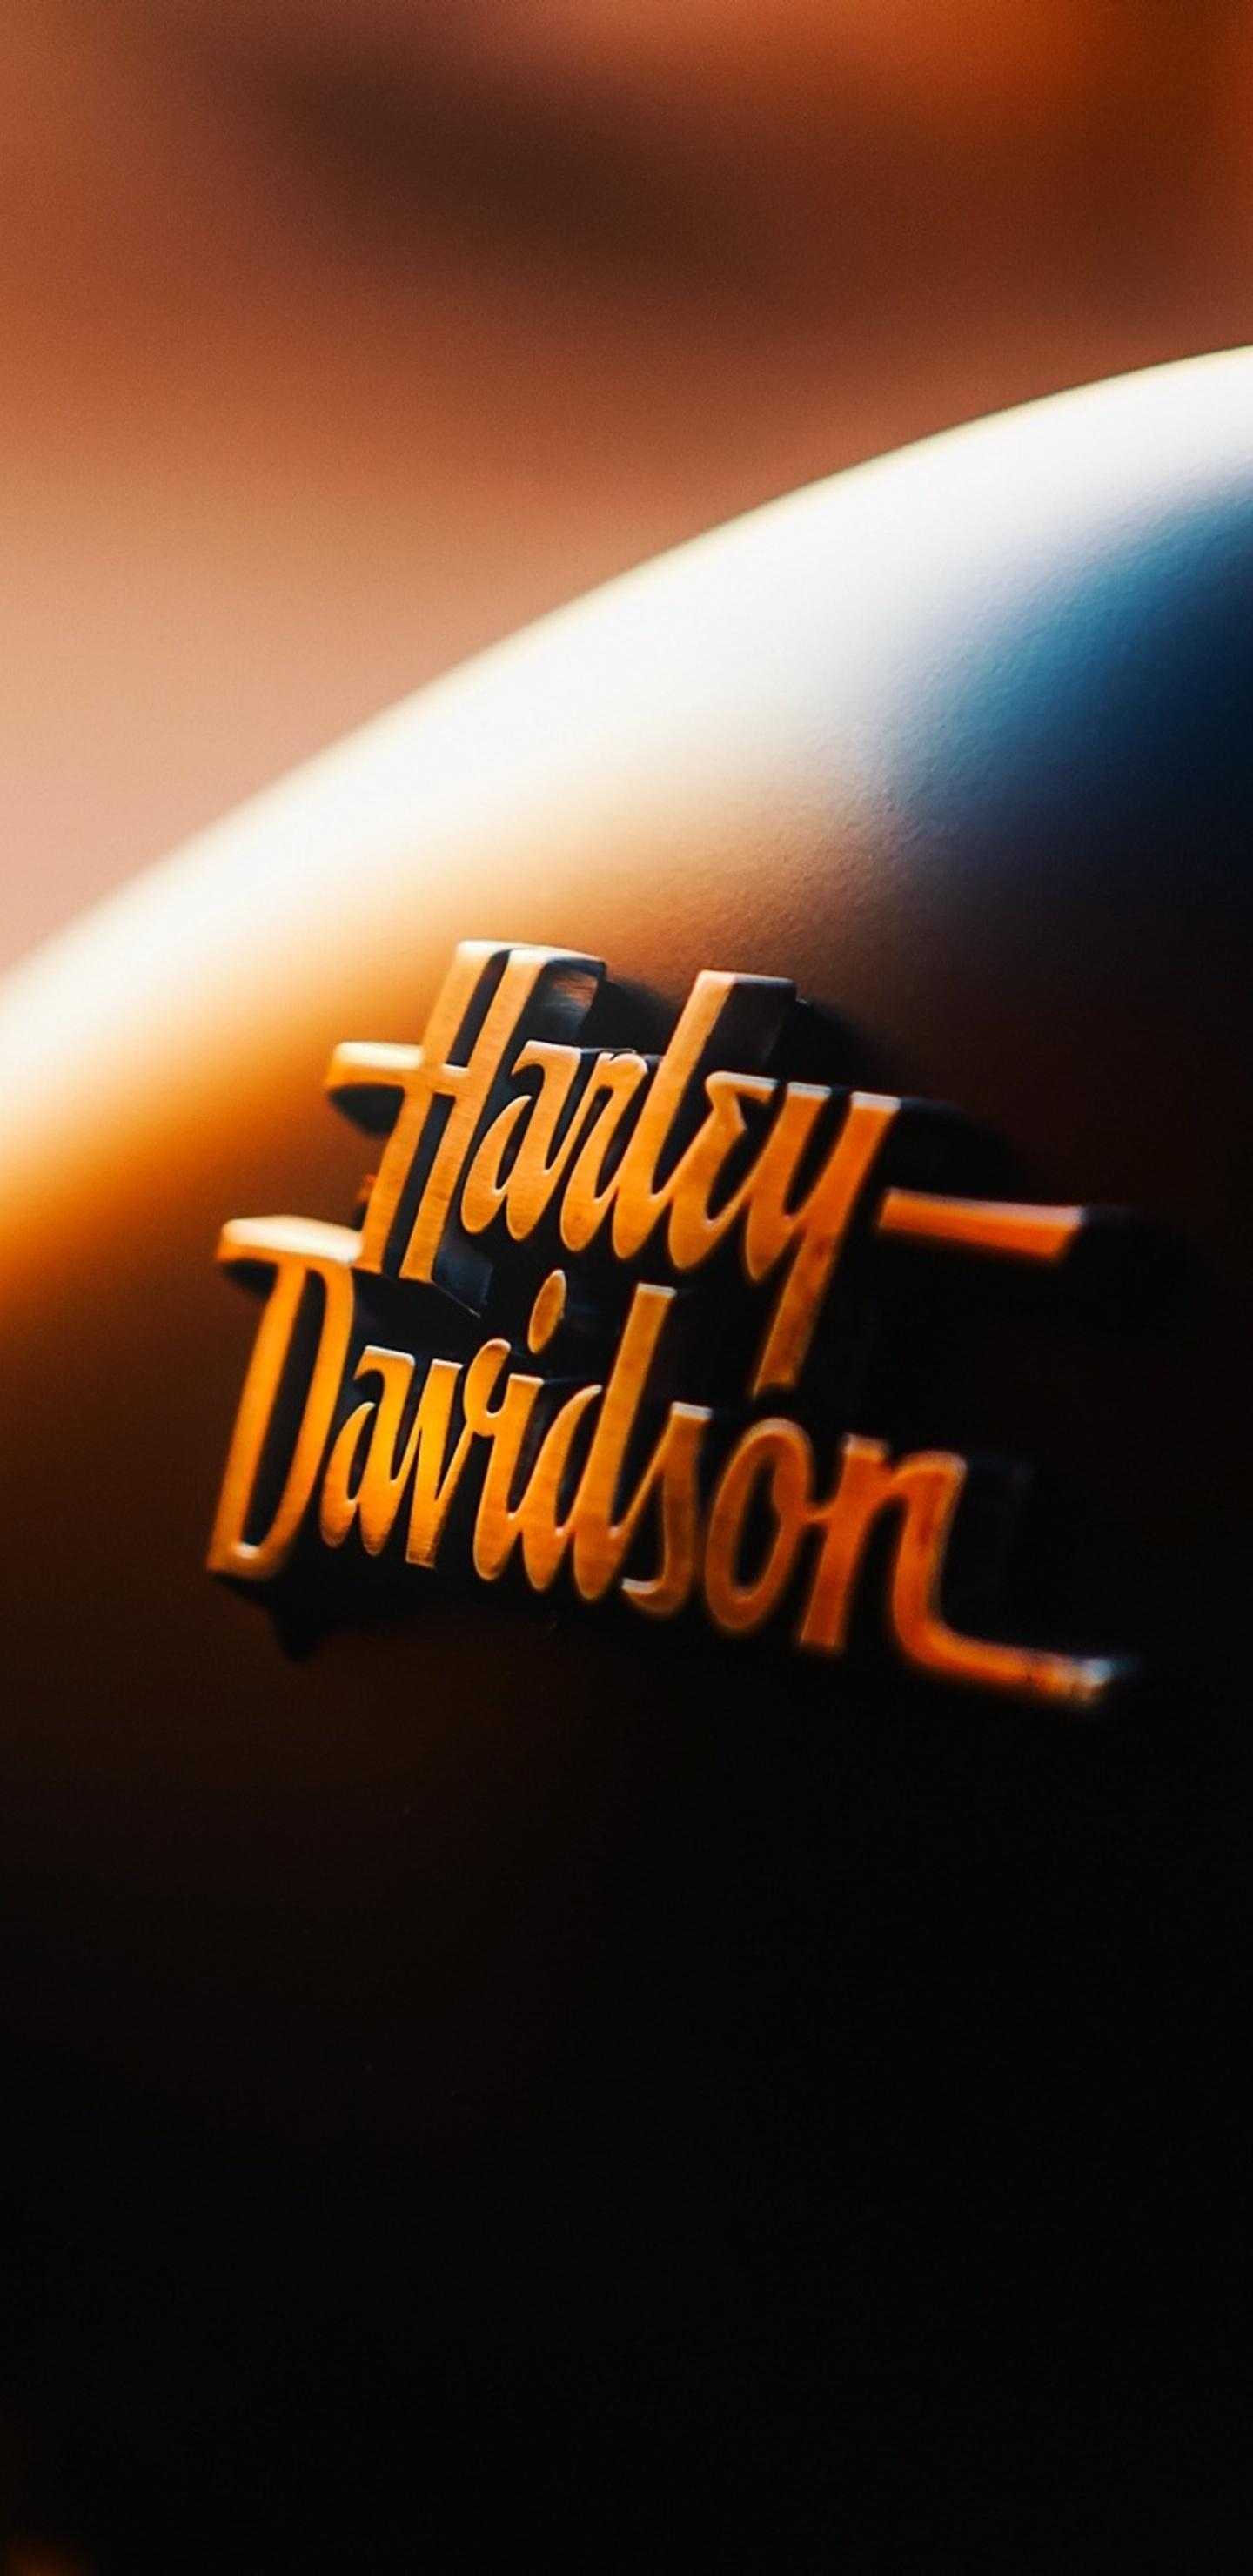 1440x2960 Harley Davidson Logo Bike Samsung Galaxy Note 98